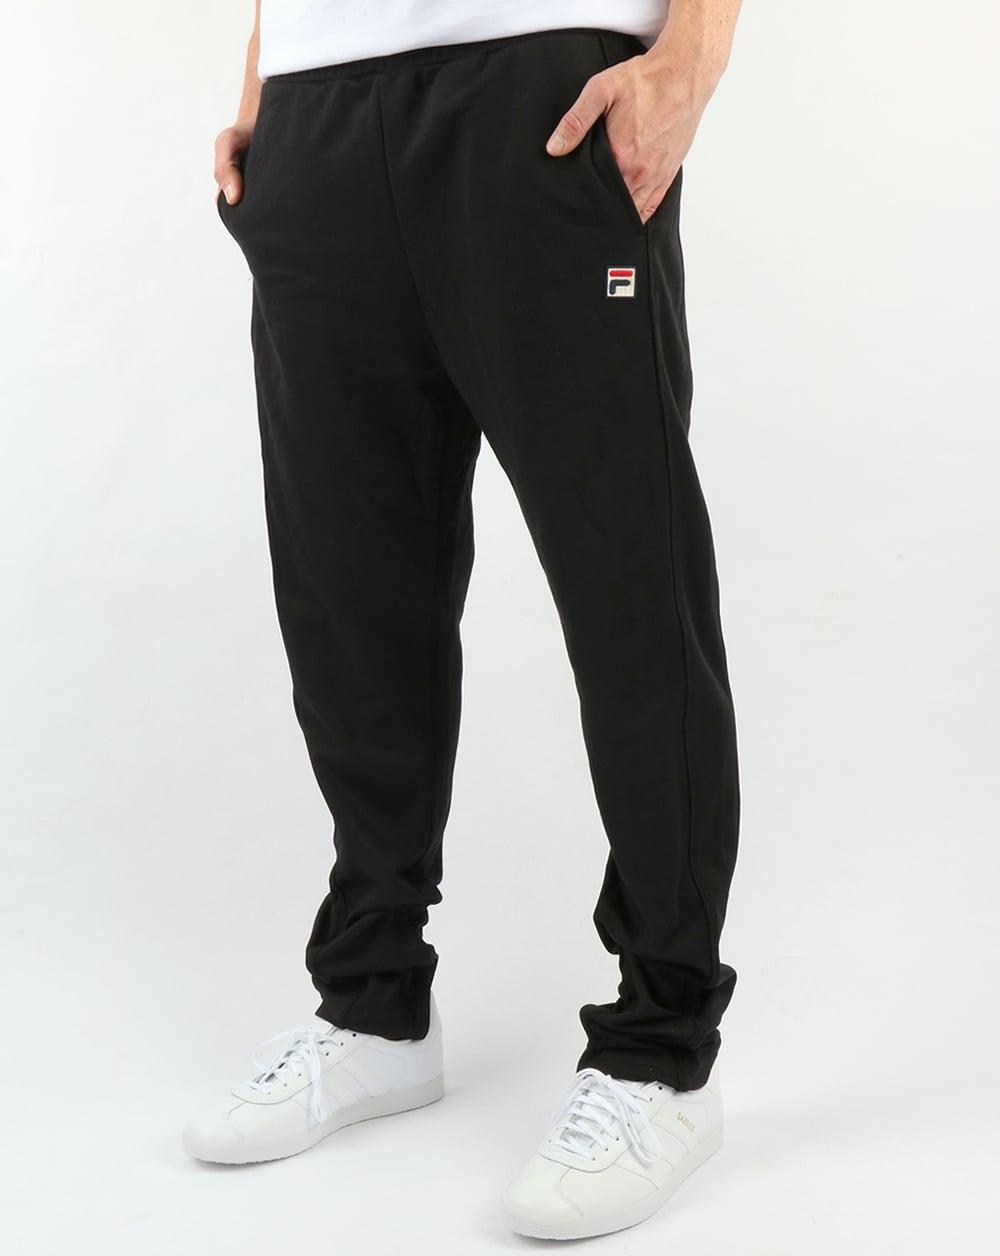 d14b6c2e99a13 Fila Vintage Bianchi Track Pants Black,tracksuit,bottoms,joggers